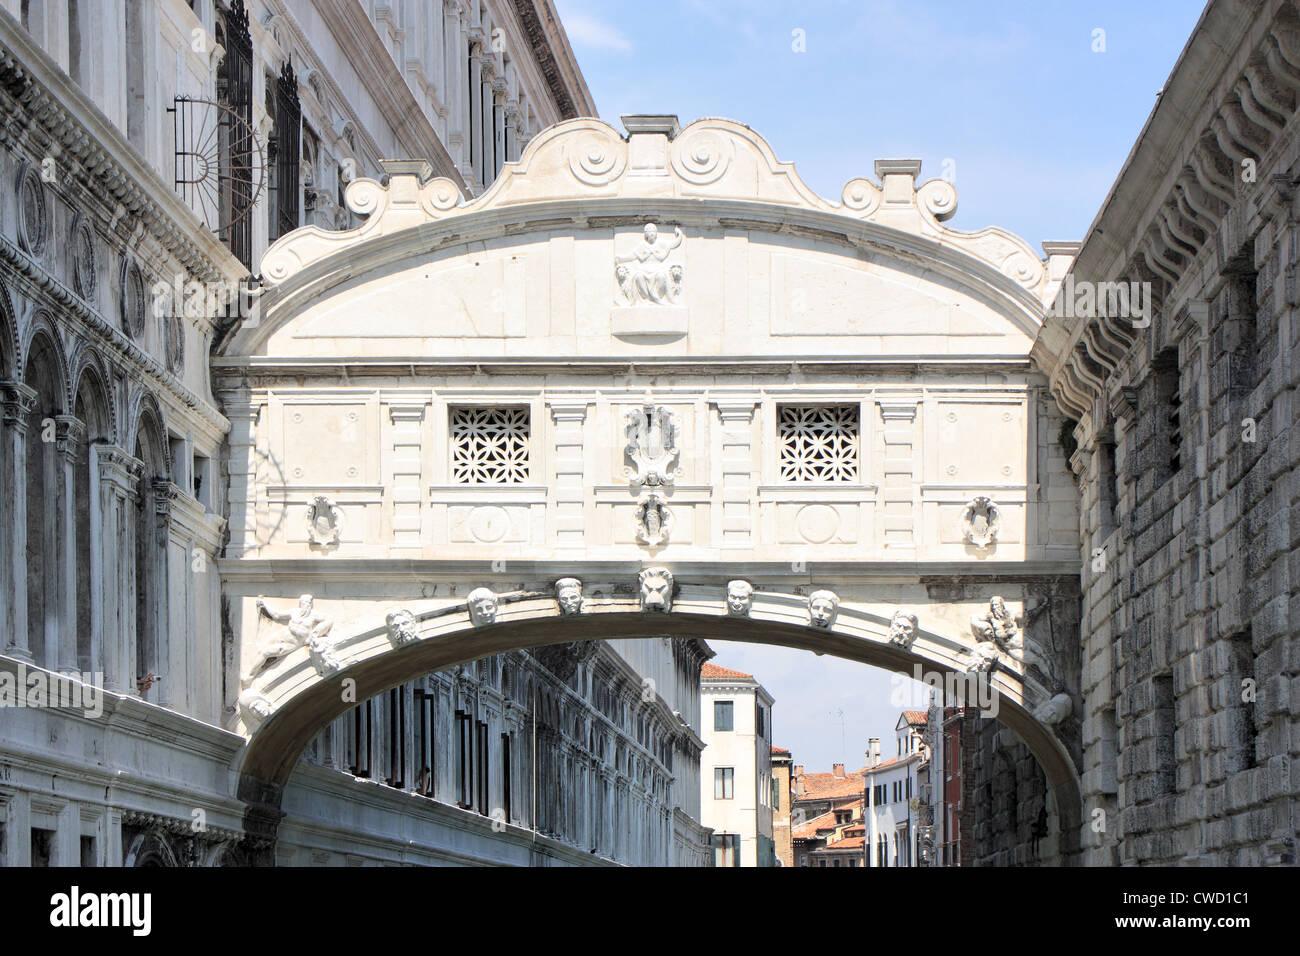 Bridge of Sighs, Venice Italy Ponte dei Sospiri, Venezia Italia Seufzerbrücke, Venedig Italien Pont des Soupirs, - Stock Image